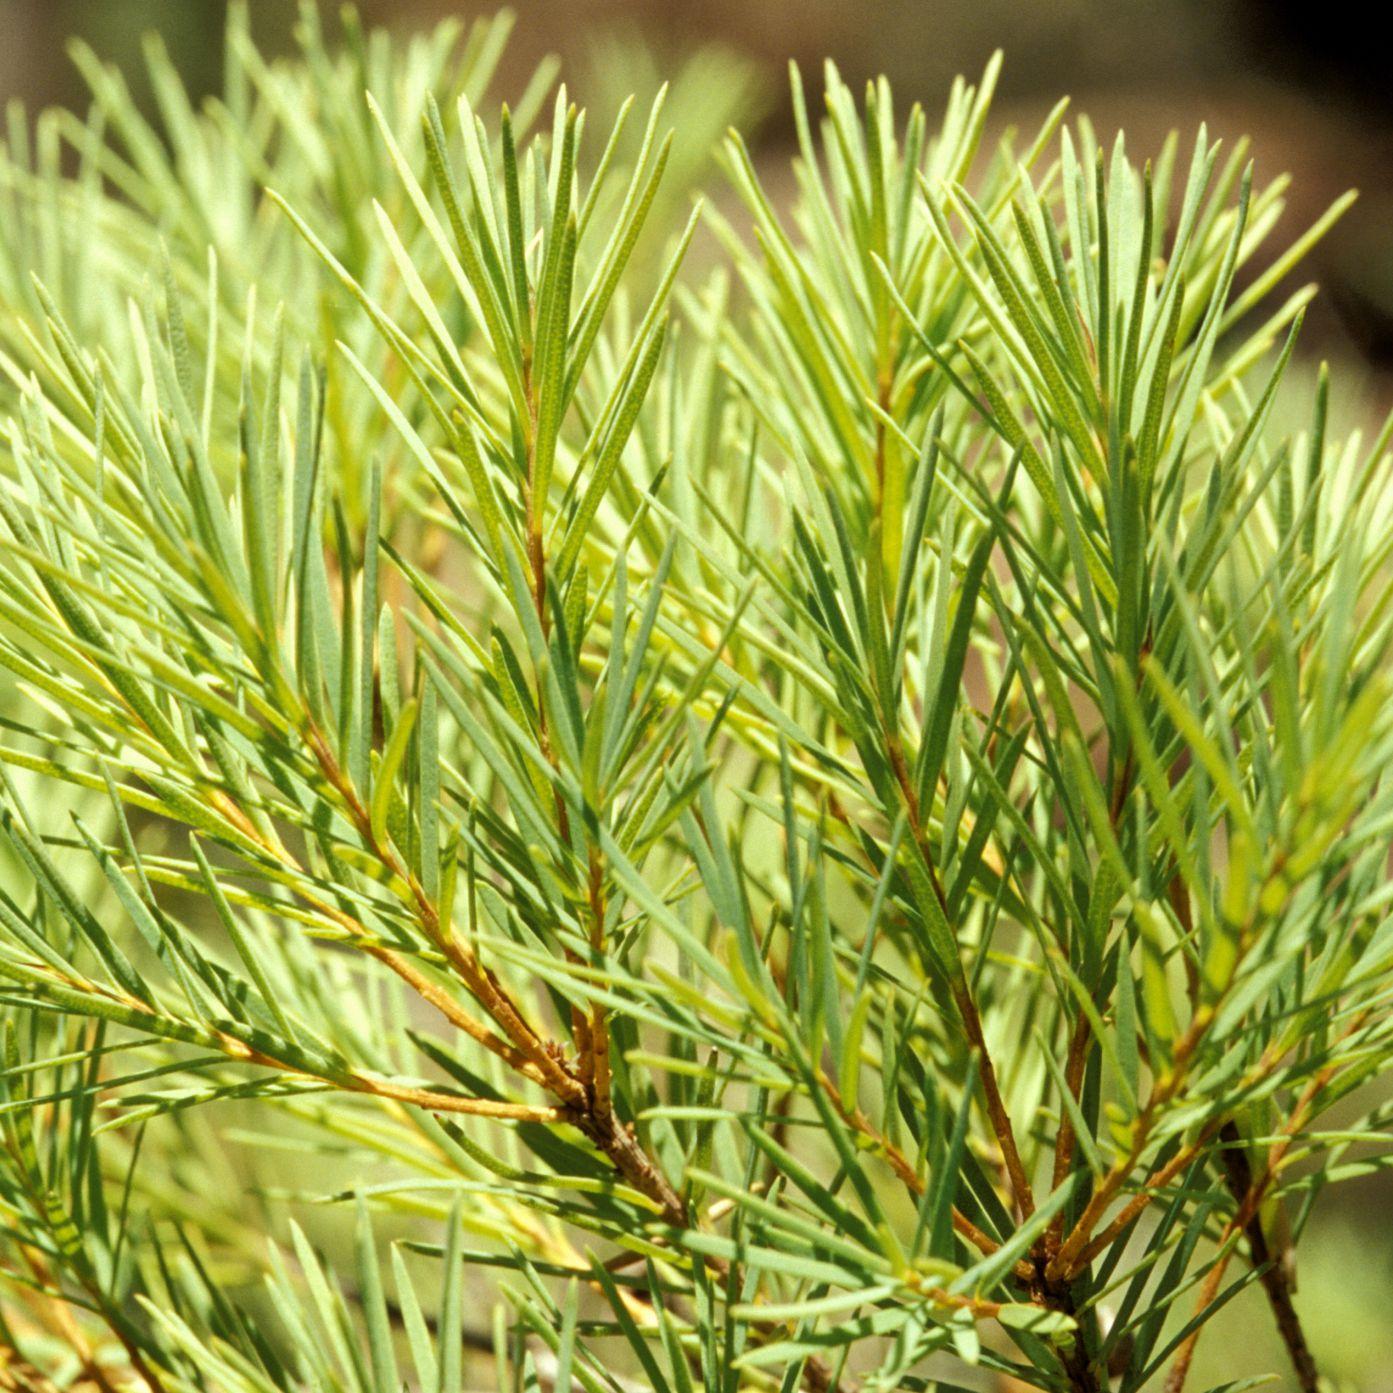 Use Tea Tree Oil Anti-Fungal and More